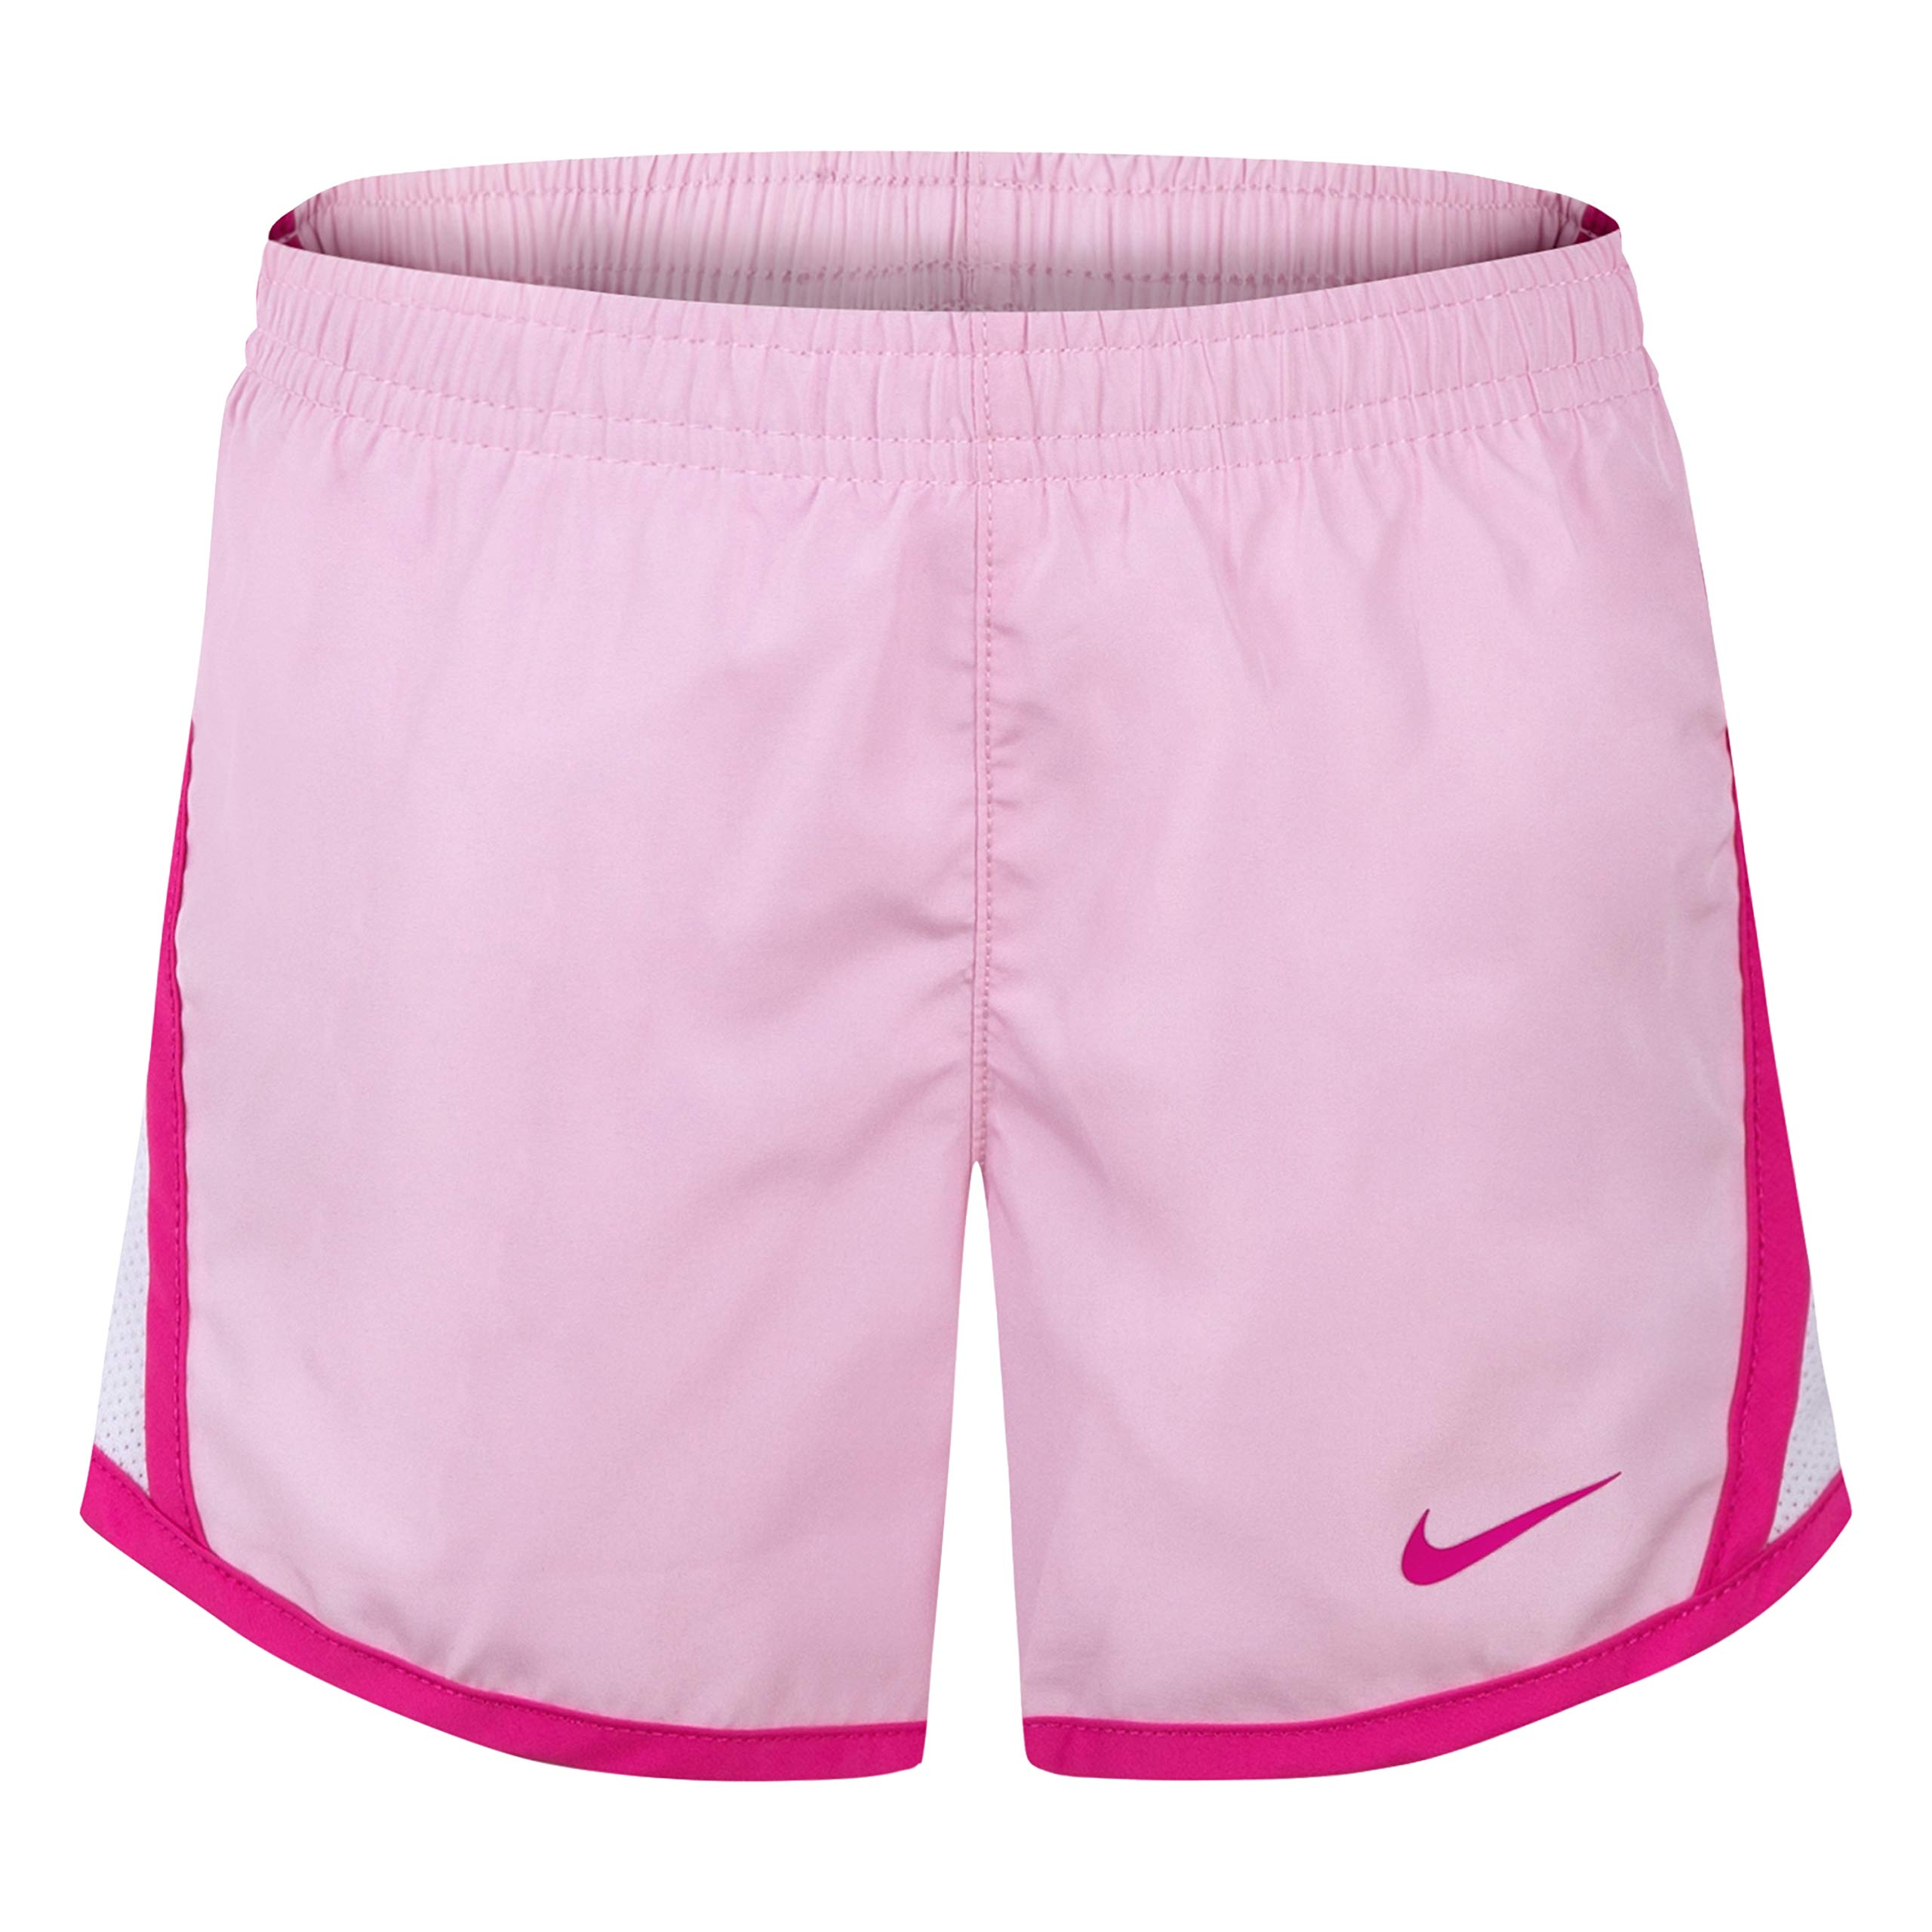 NIKE Children's Apparel Girls' Little Dri-FIT Tempo Shorts, Pink Foam, 4 by NIKE Children's Apparel